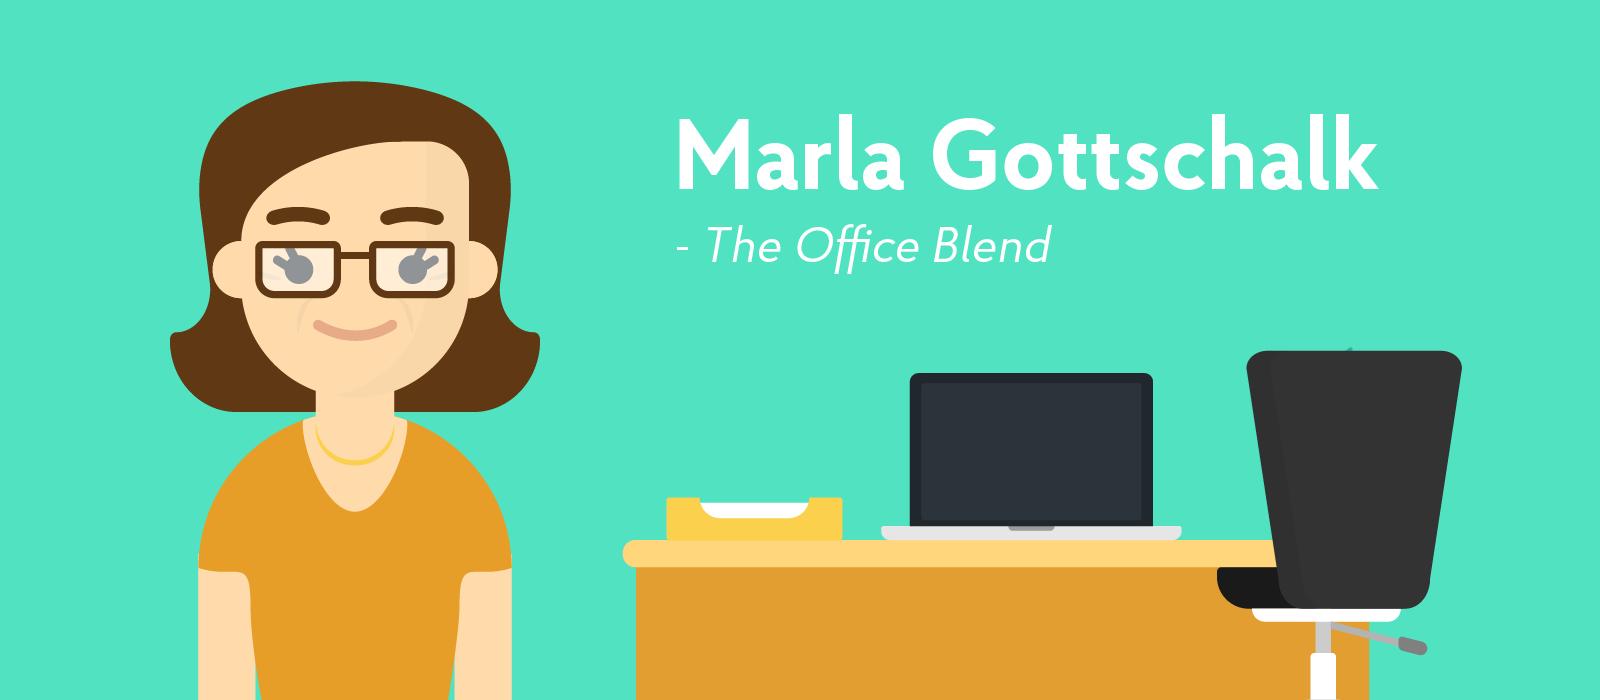 Marla Gottschalk career influencer